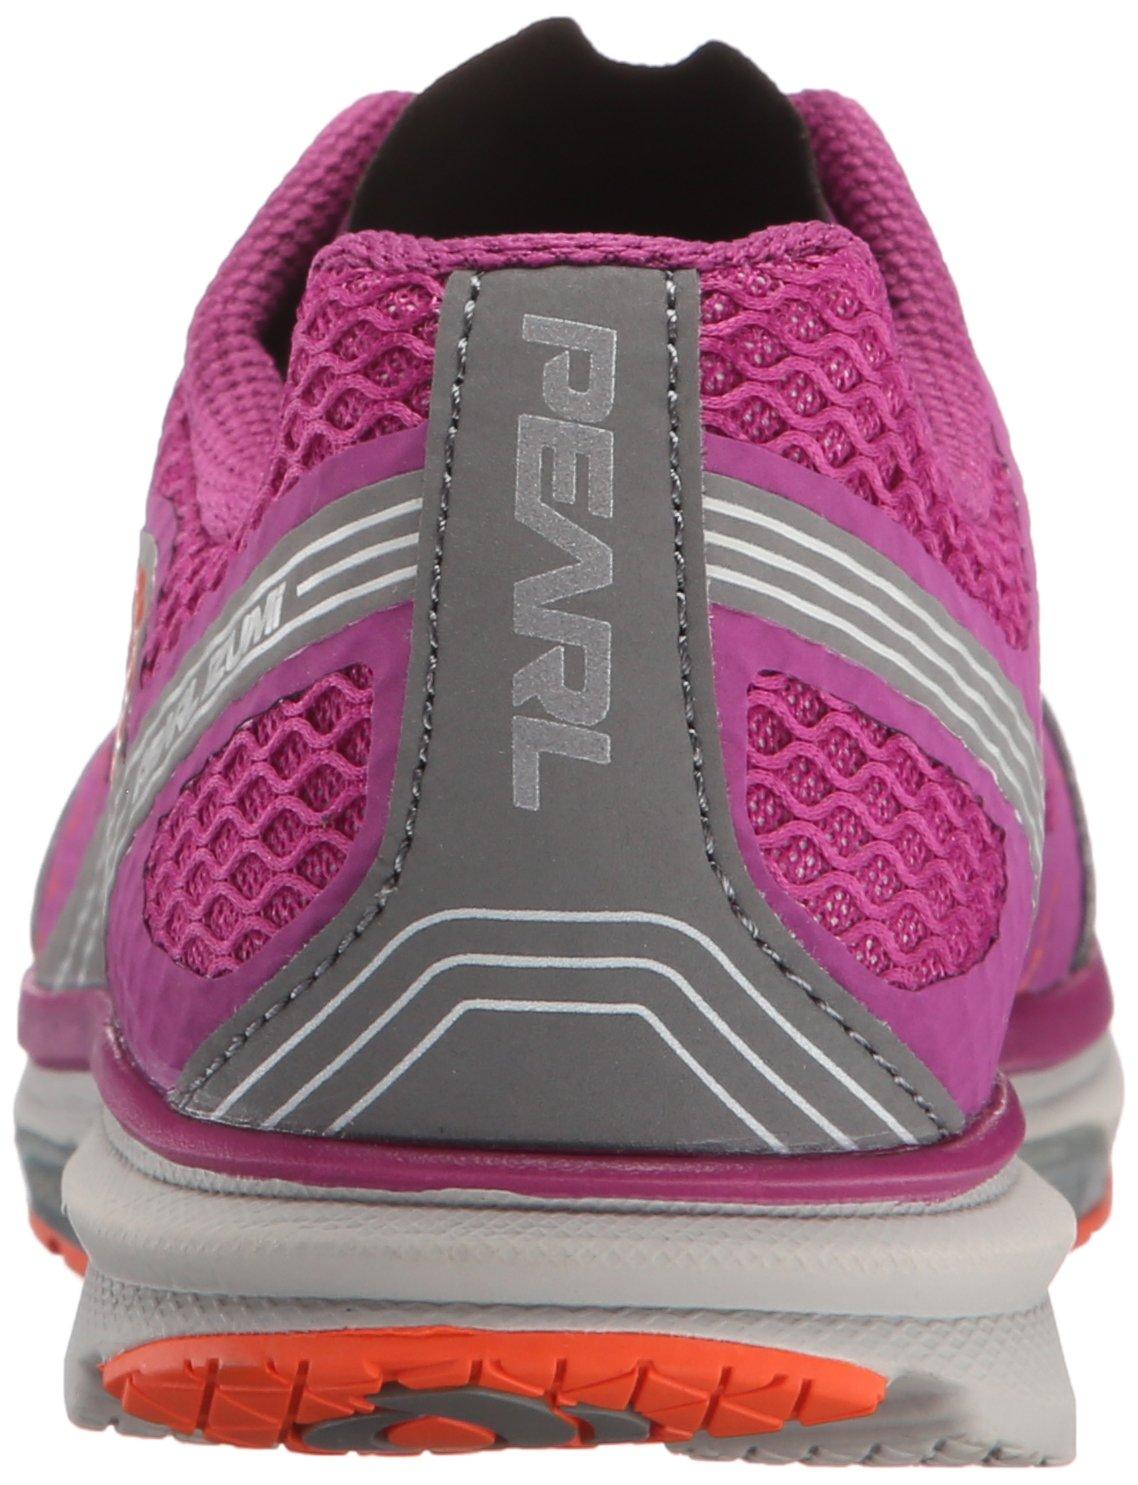 Pearl iZUMi IV Women's W X-Road Fuel IV iZUMi Cycling Shoe B00YXTMOYE 39 EU/7.59 B US|Purple Wine/Shadow Grey 209cb4